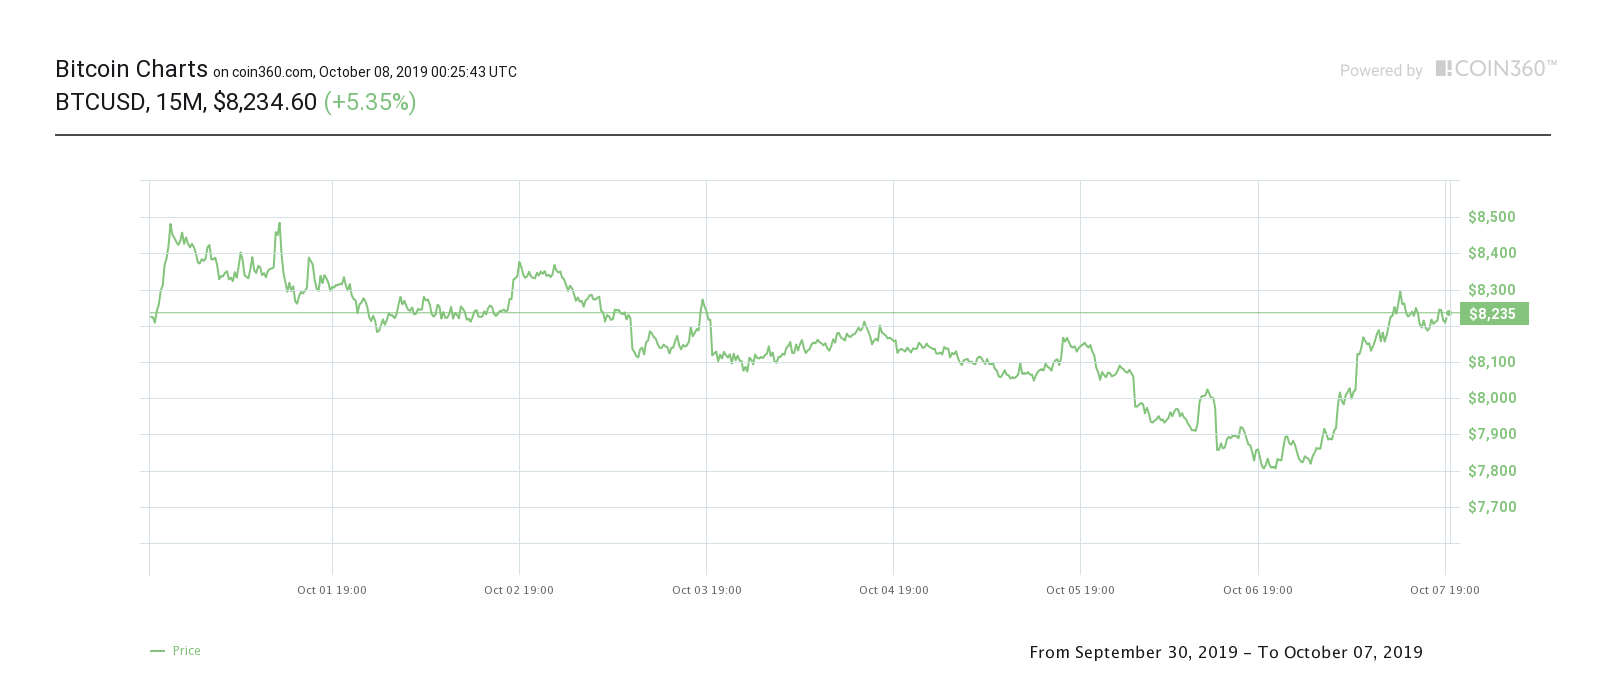 Crypto Market Continues to Show Green Candlesticks, BTC Recovers to $8,200, CryptoCoinNewsHub.com